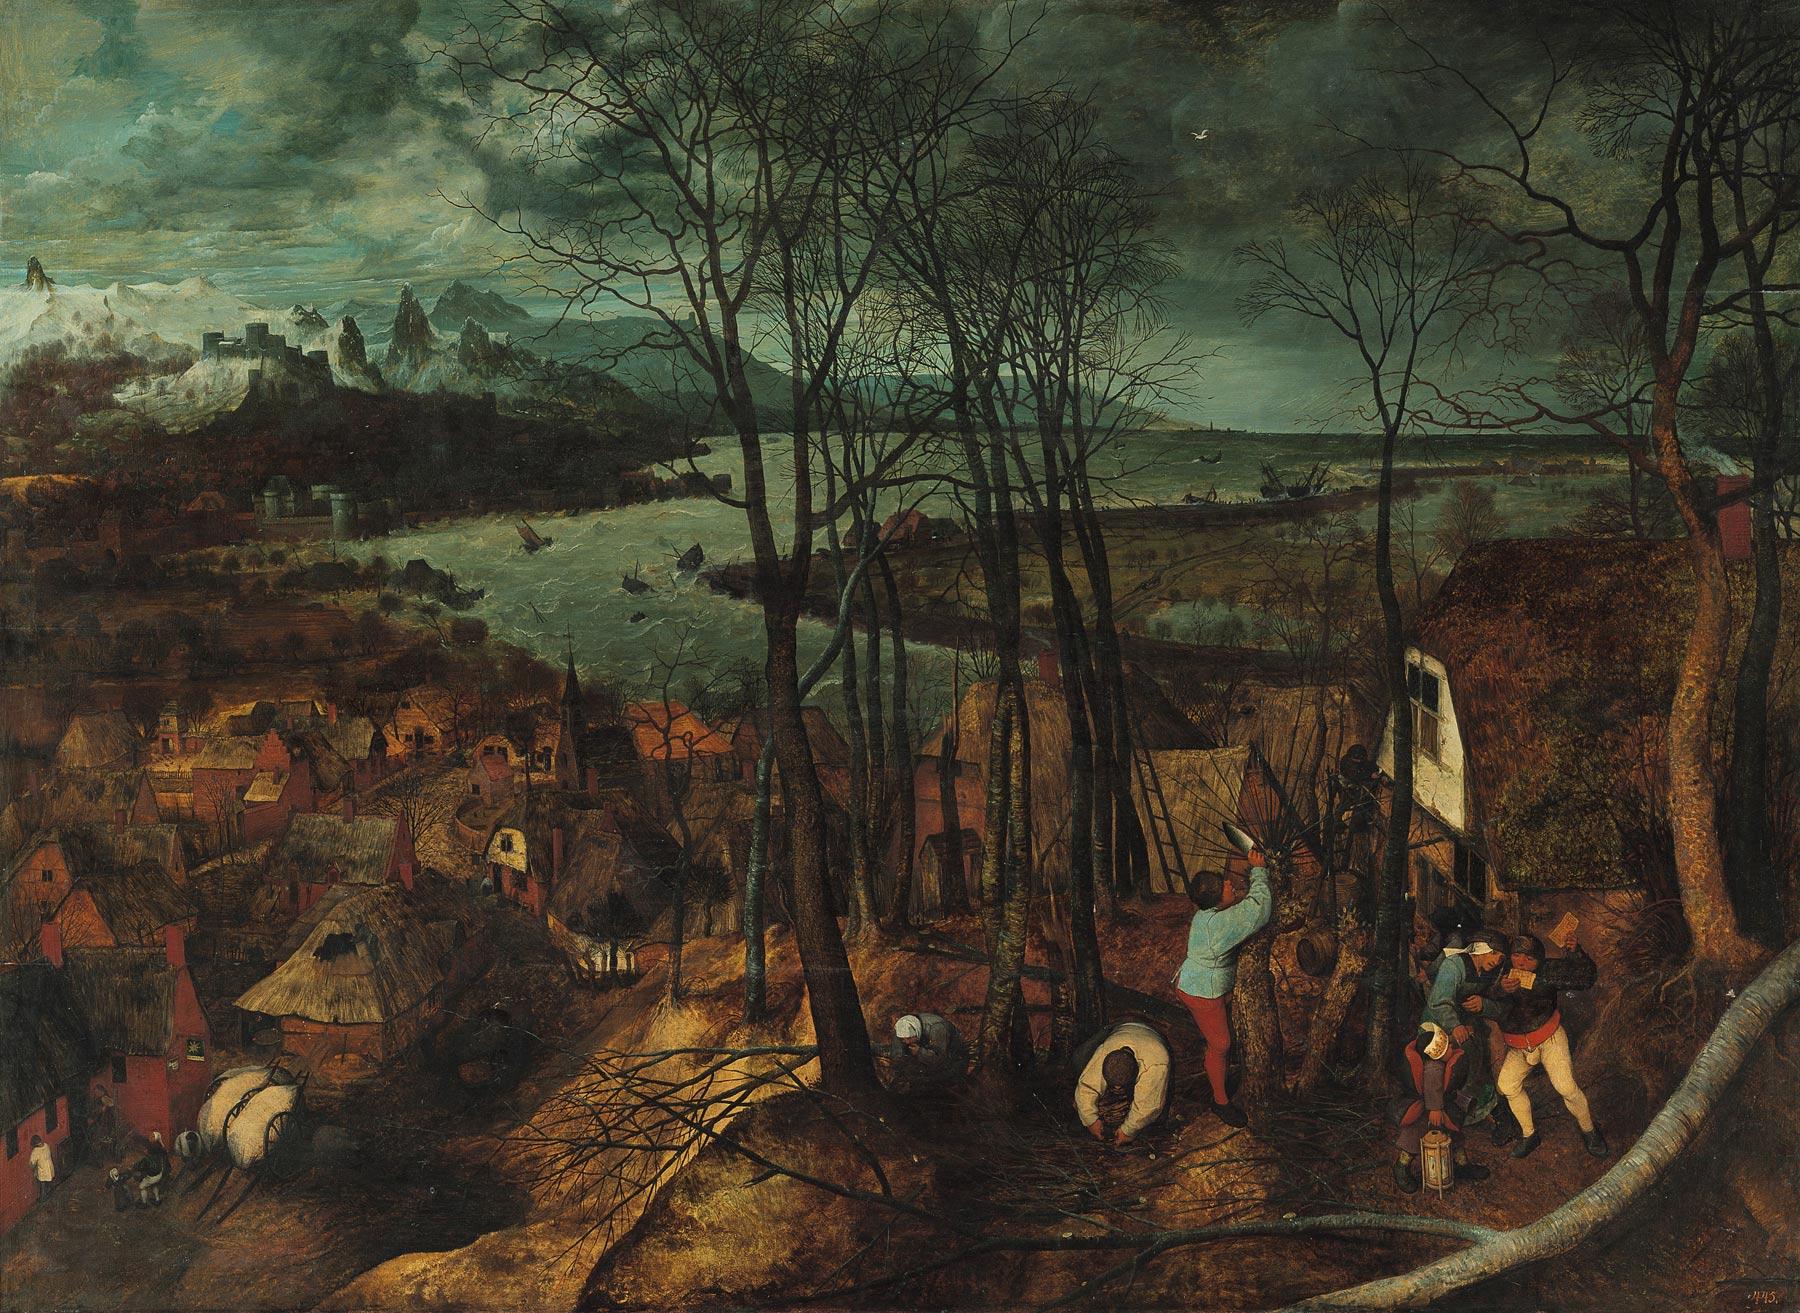 Pieter Bruegel, La giornata buia (1565; olio su tavola, 118 x 163 cm; Vienna, Kunsthistorisches Museum)